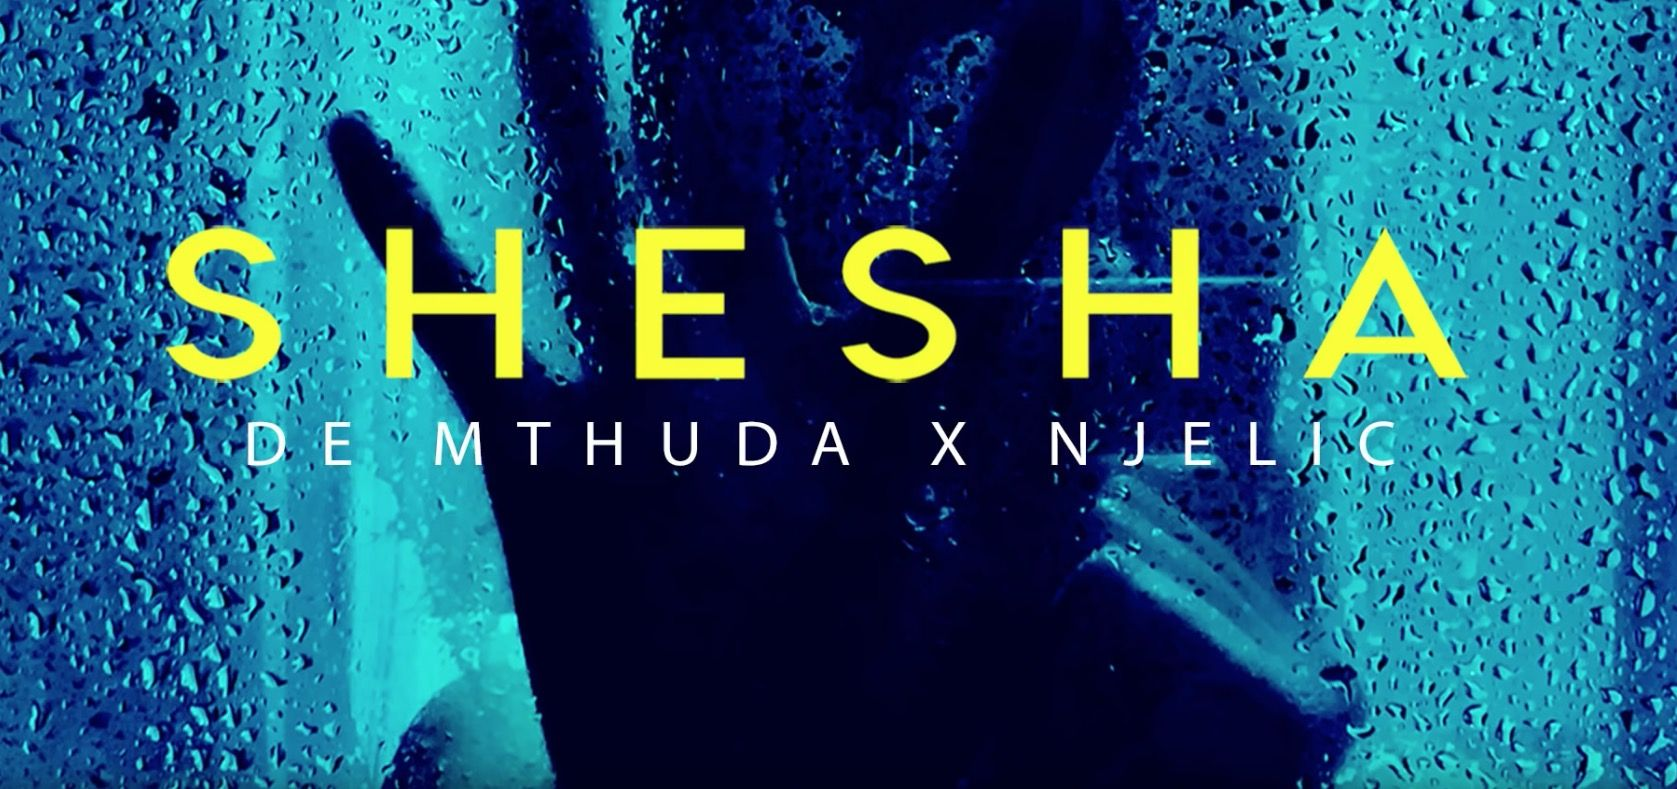 Shesha-lyrics-De-Mthuda-.jpg